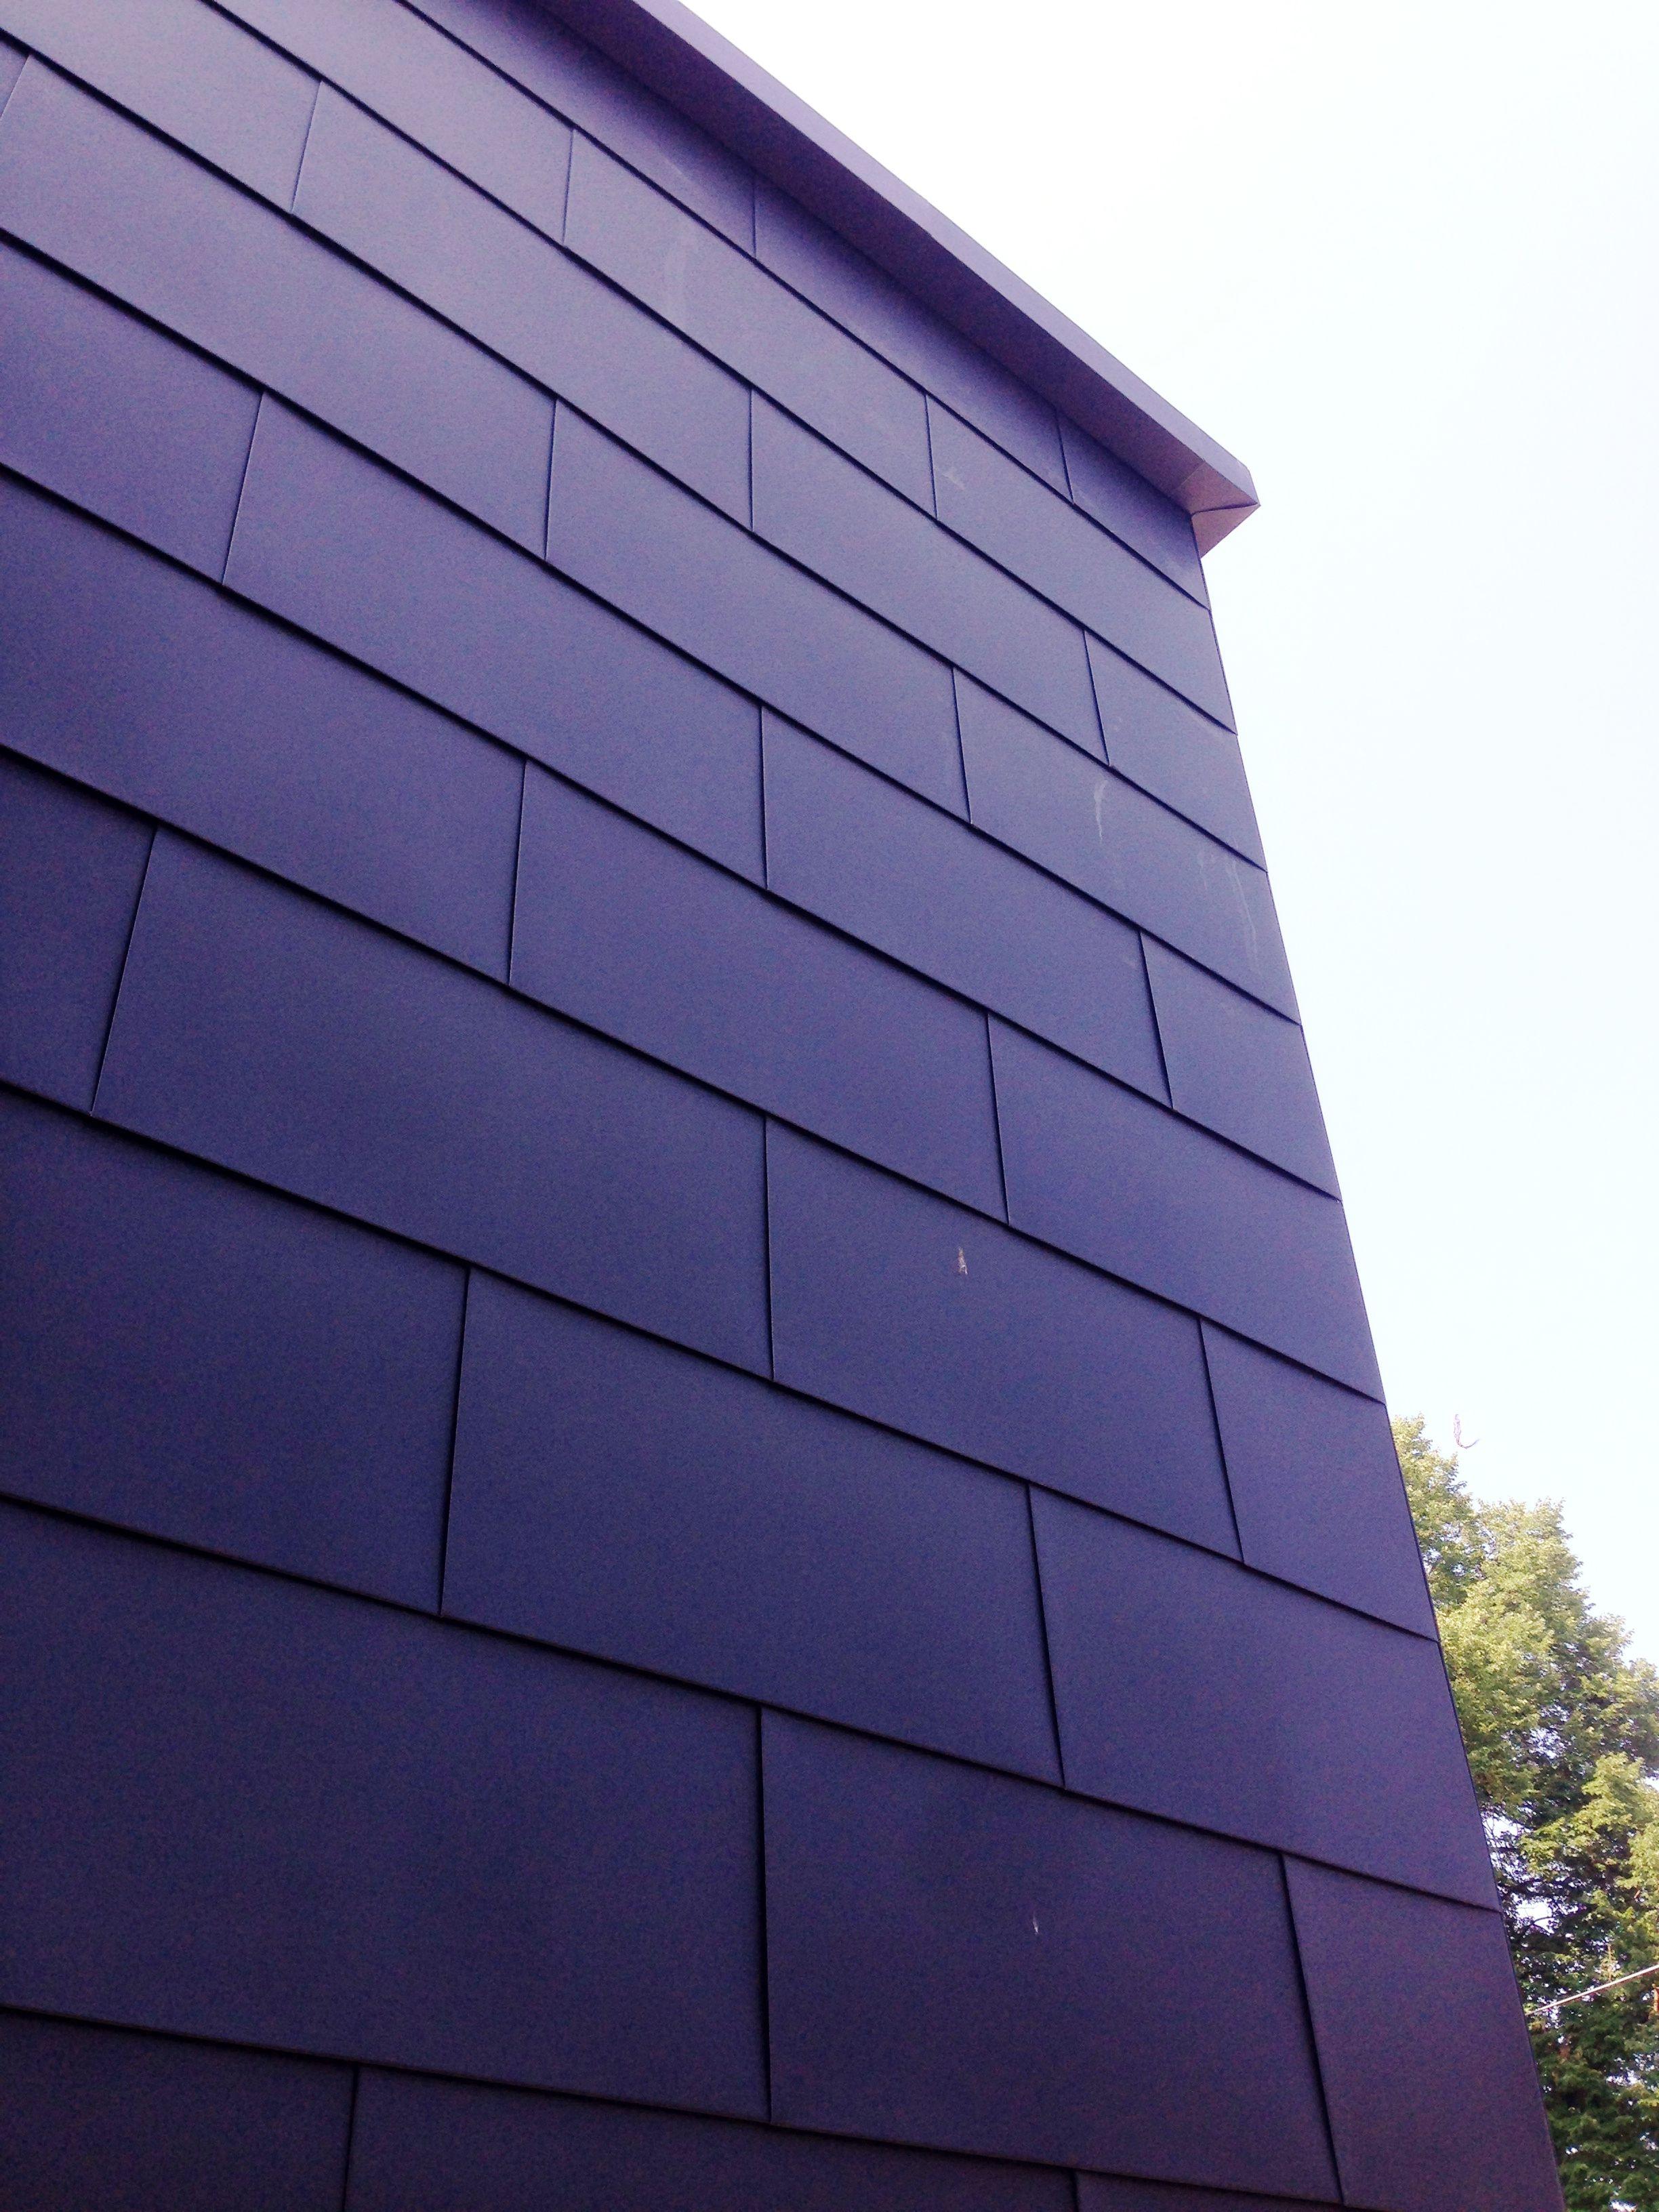 Flat Lock Zinc Wall Panels Exterior Wall Panels Exterior Cladding Standing Seam